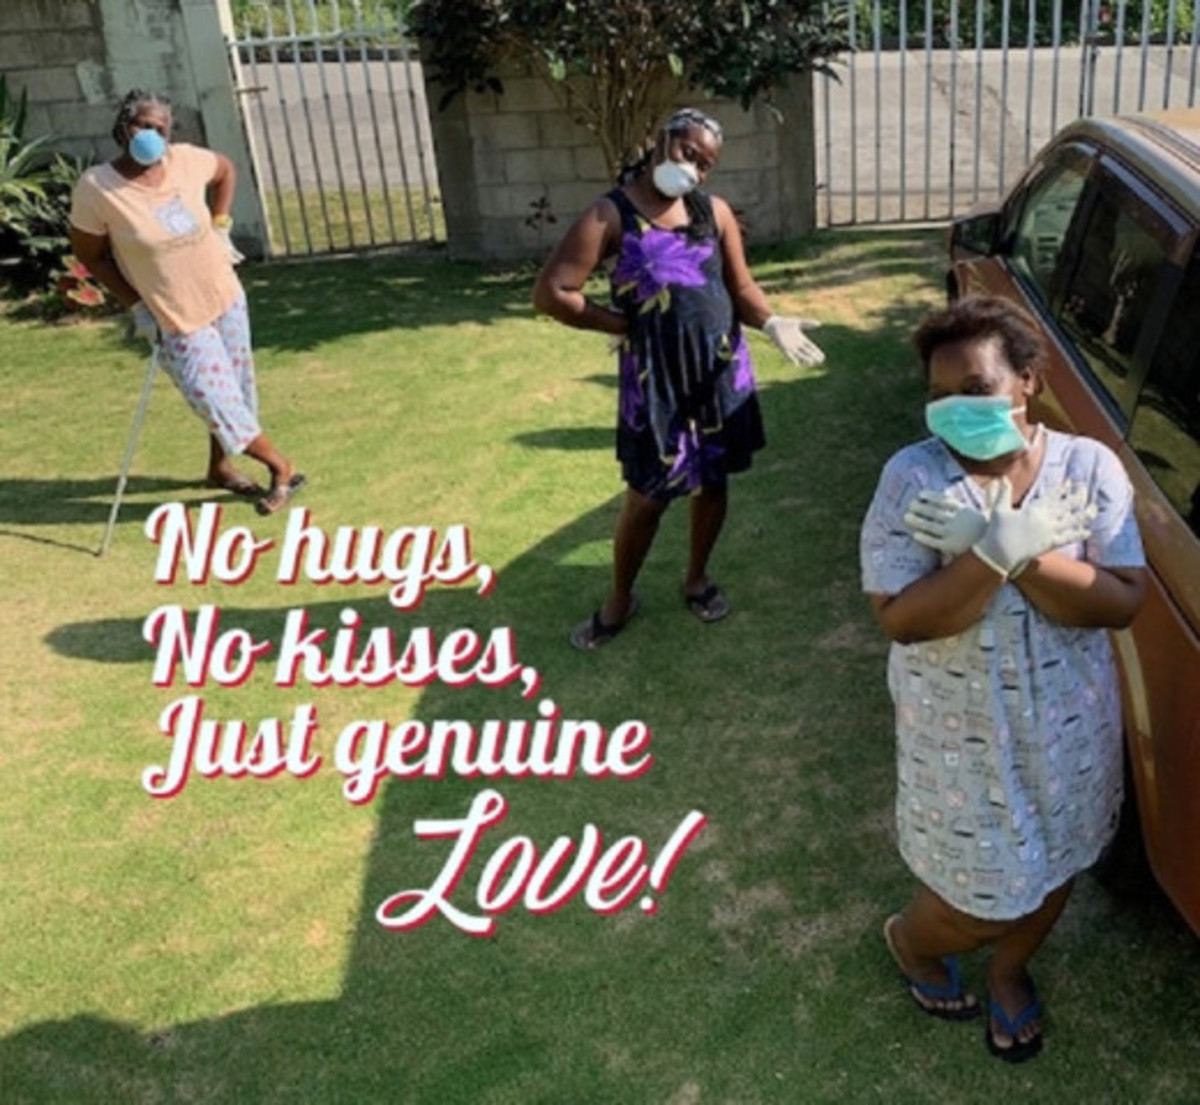 No hugs, no kisses, just genuine love.